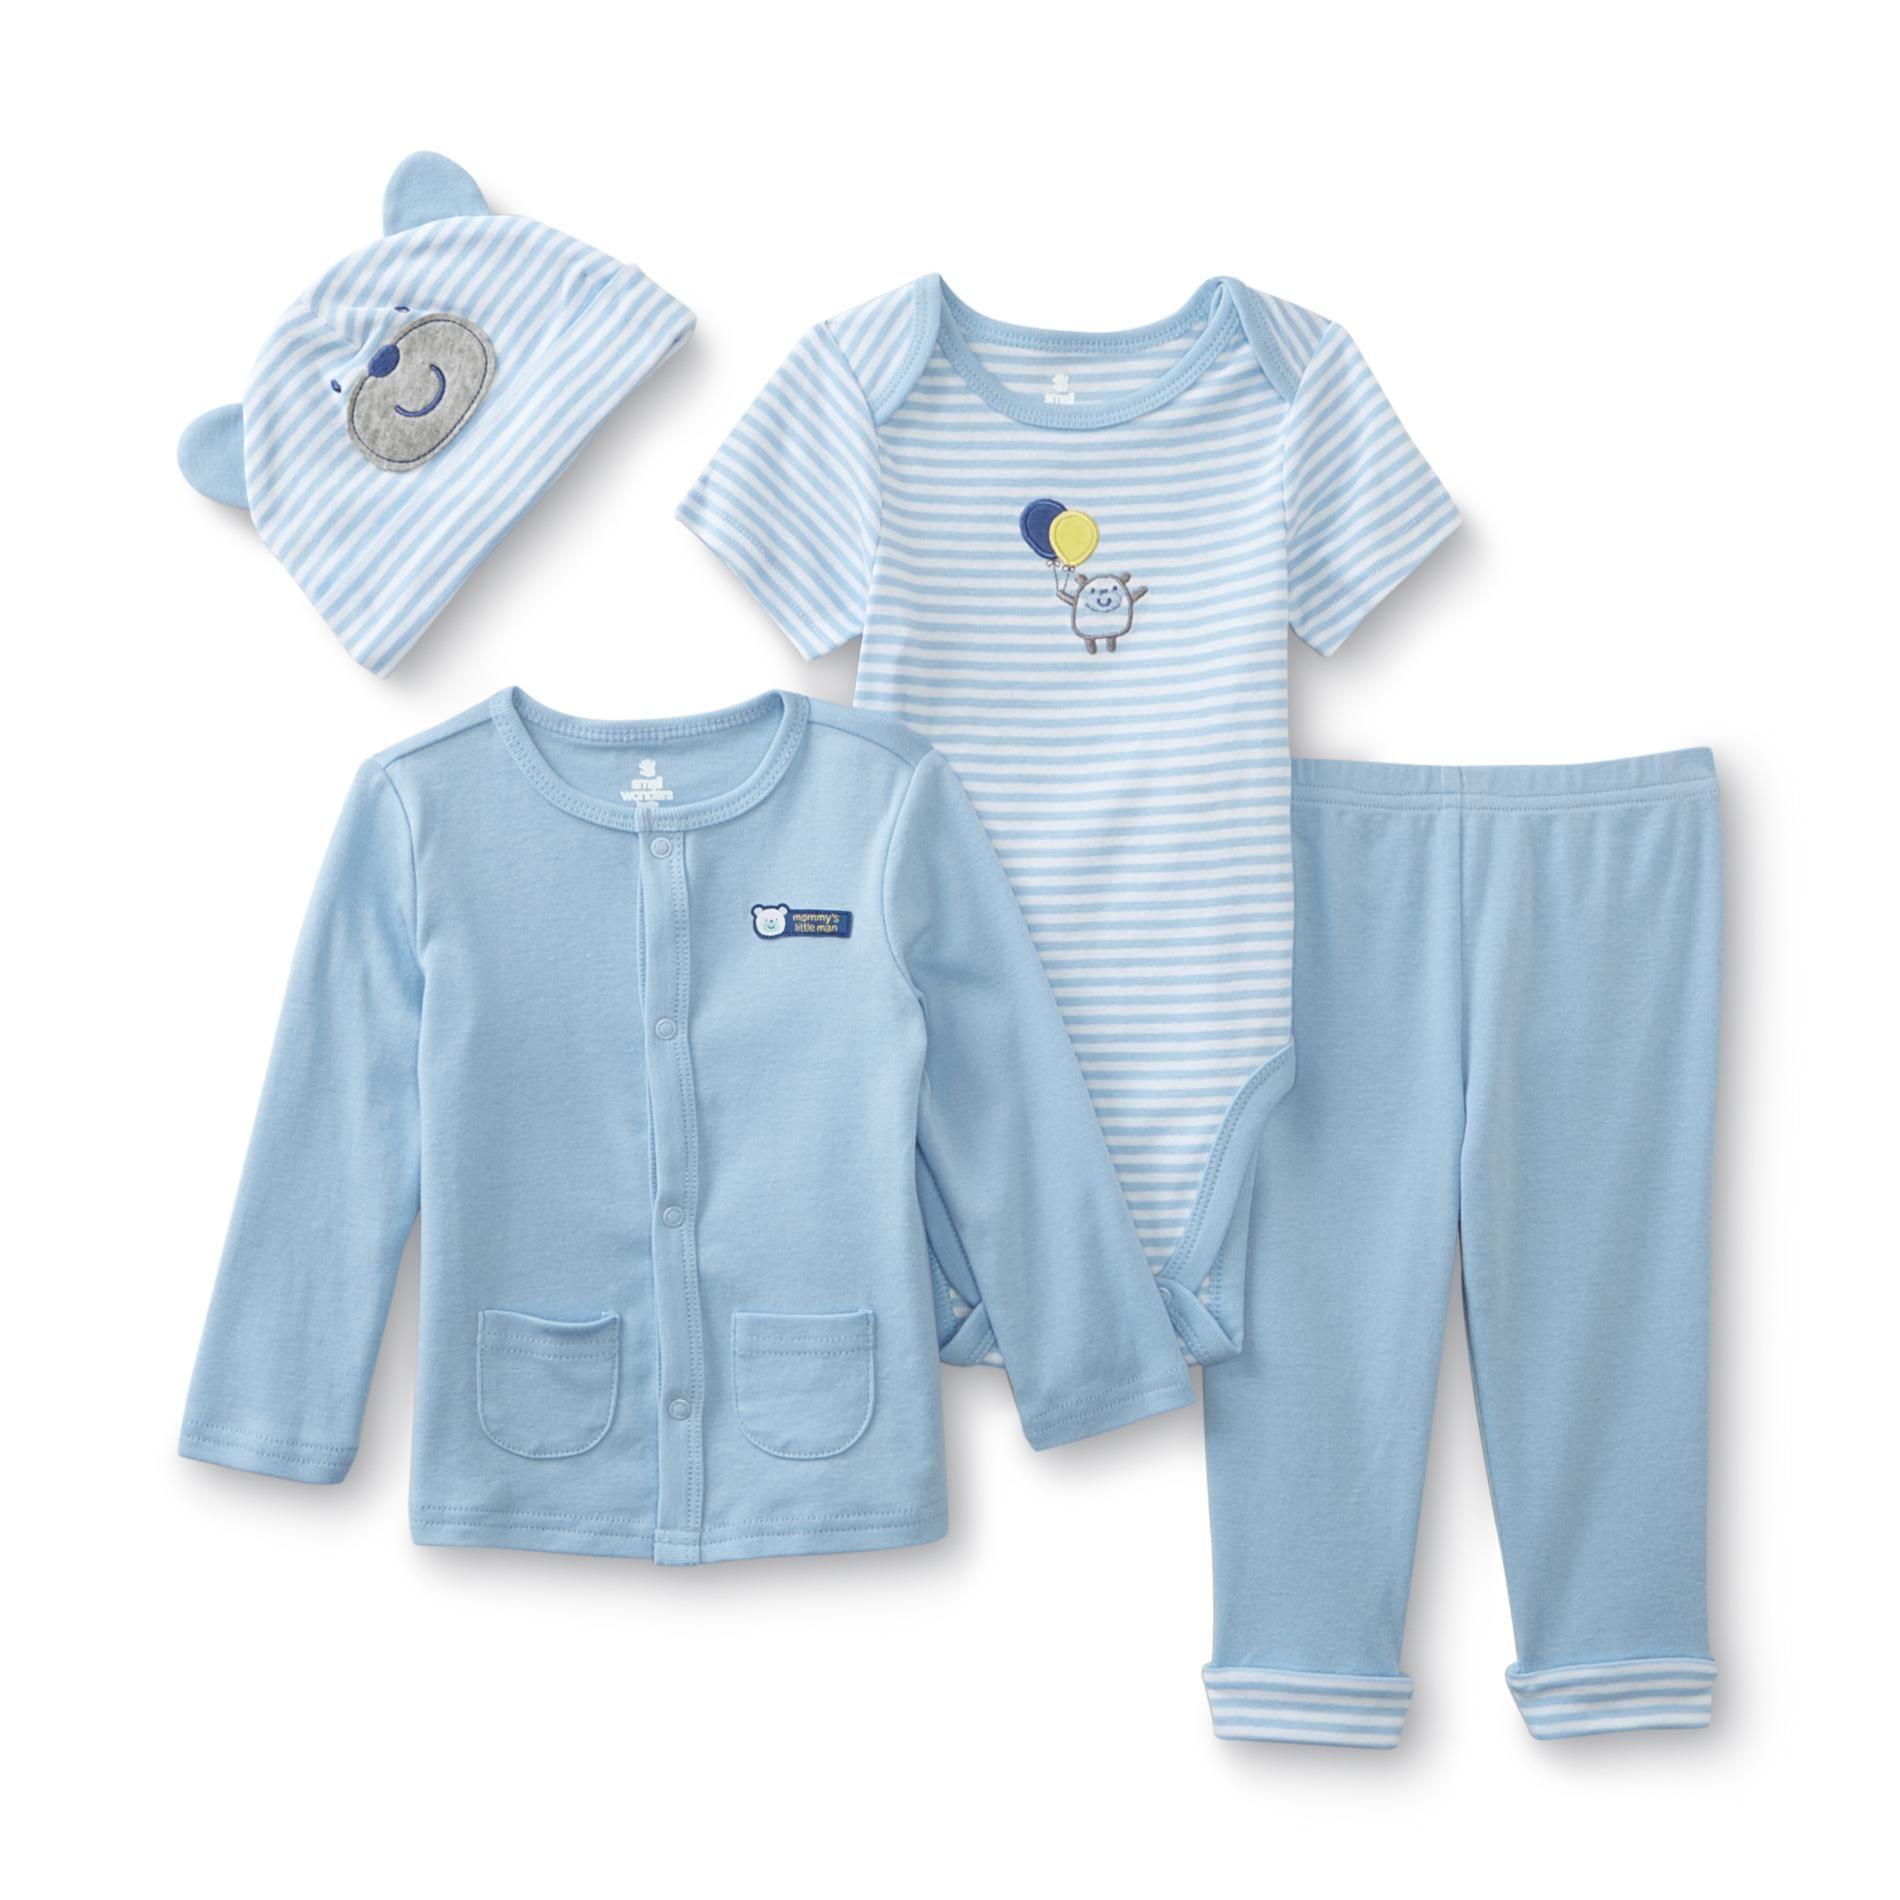 Small Wonders Newborn Boy s 4 Piece Layette Set Bear Size 6 9